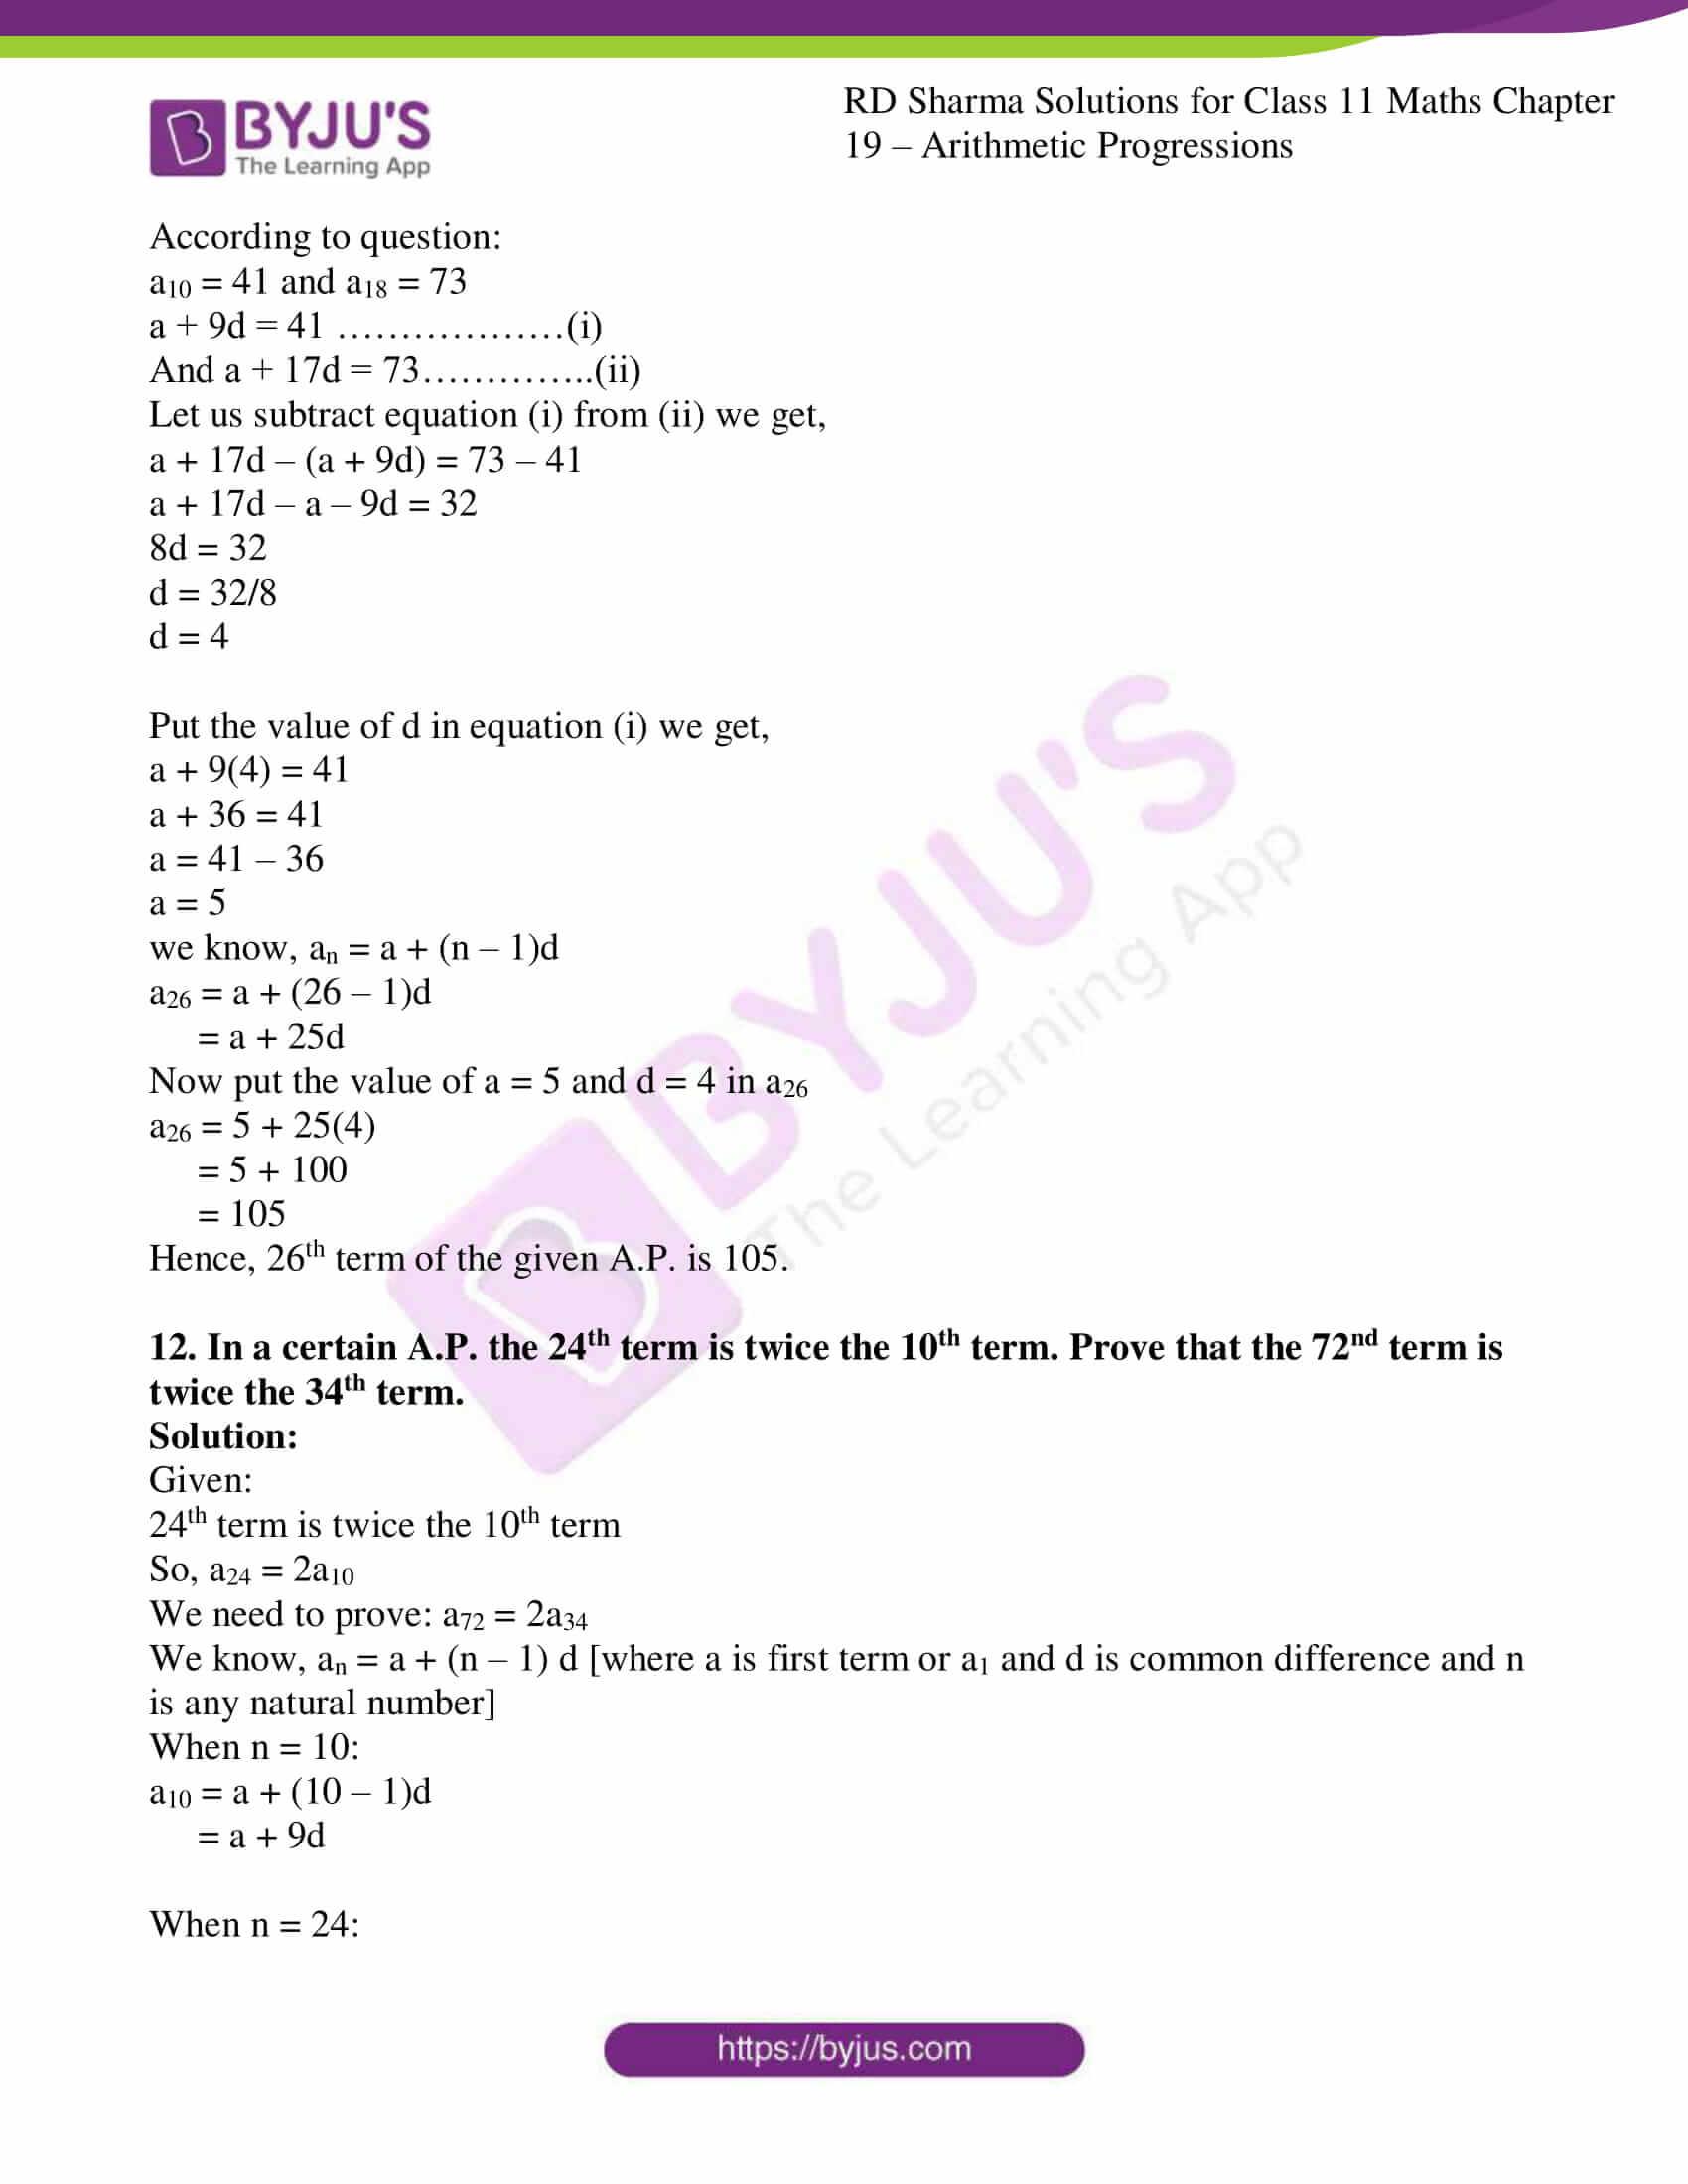 rd sharma class 11 maths ch 19 ex 2 11